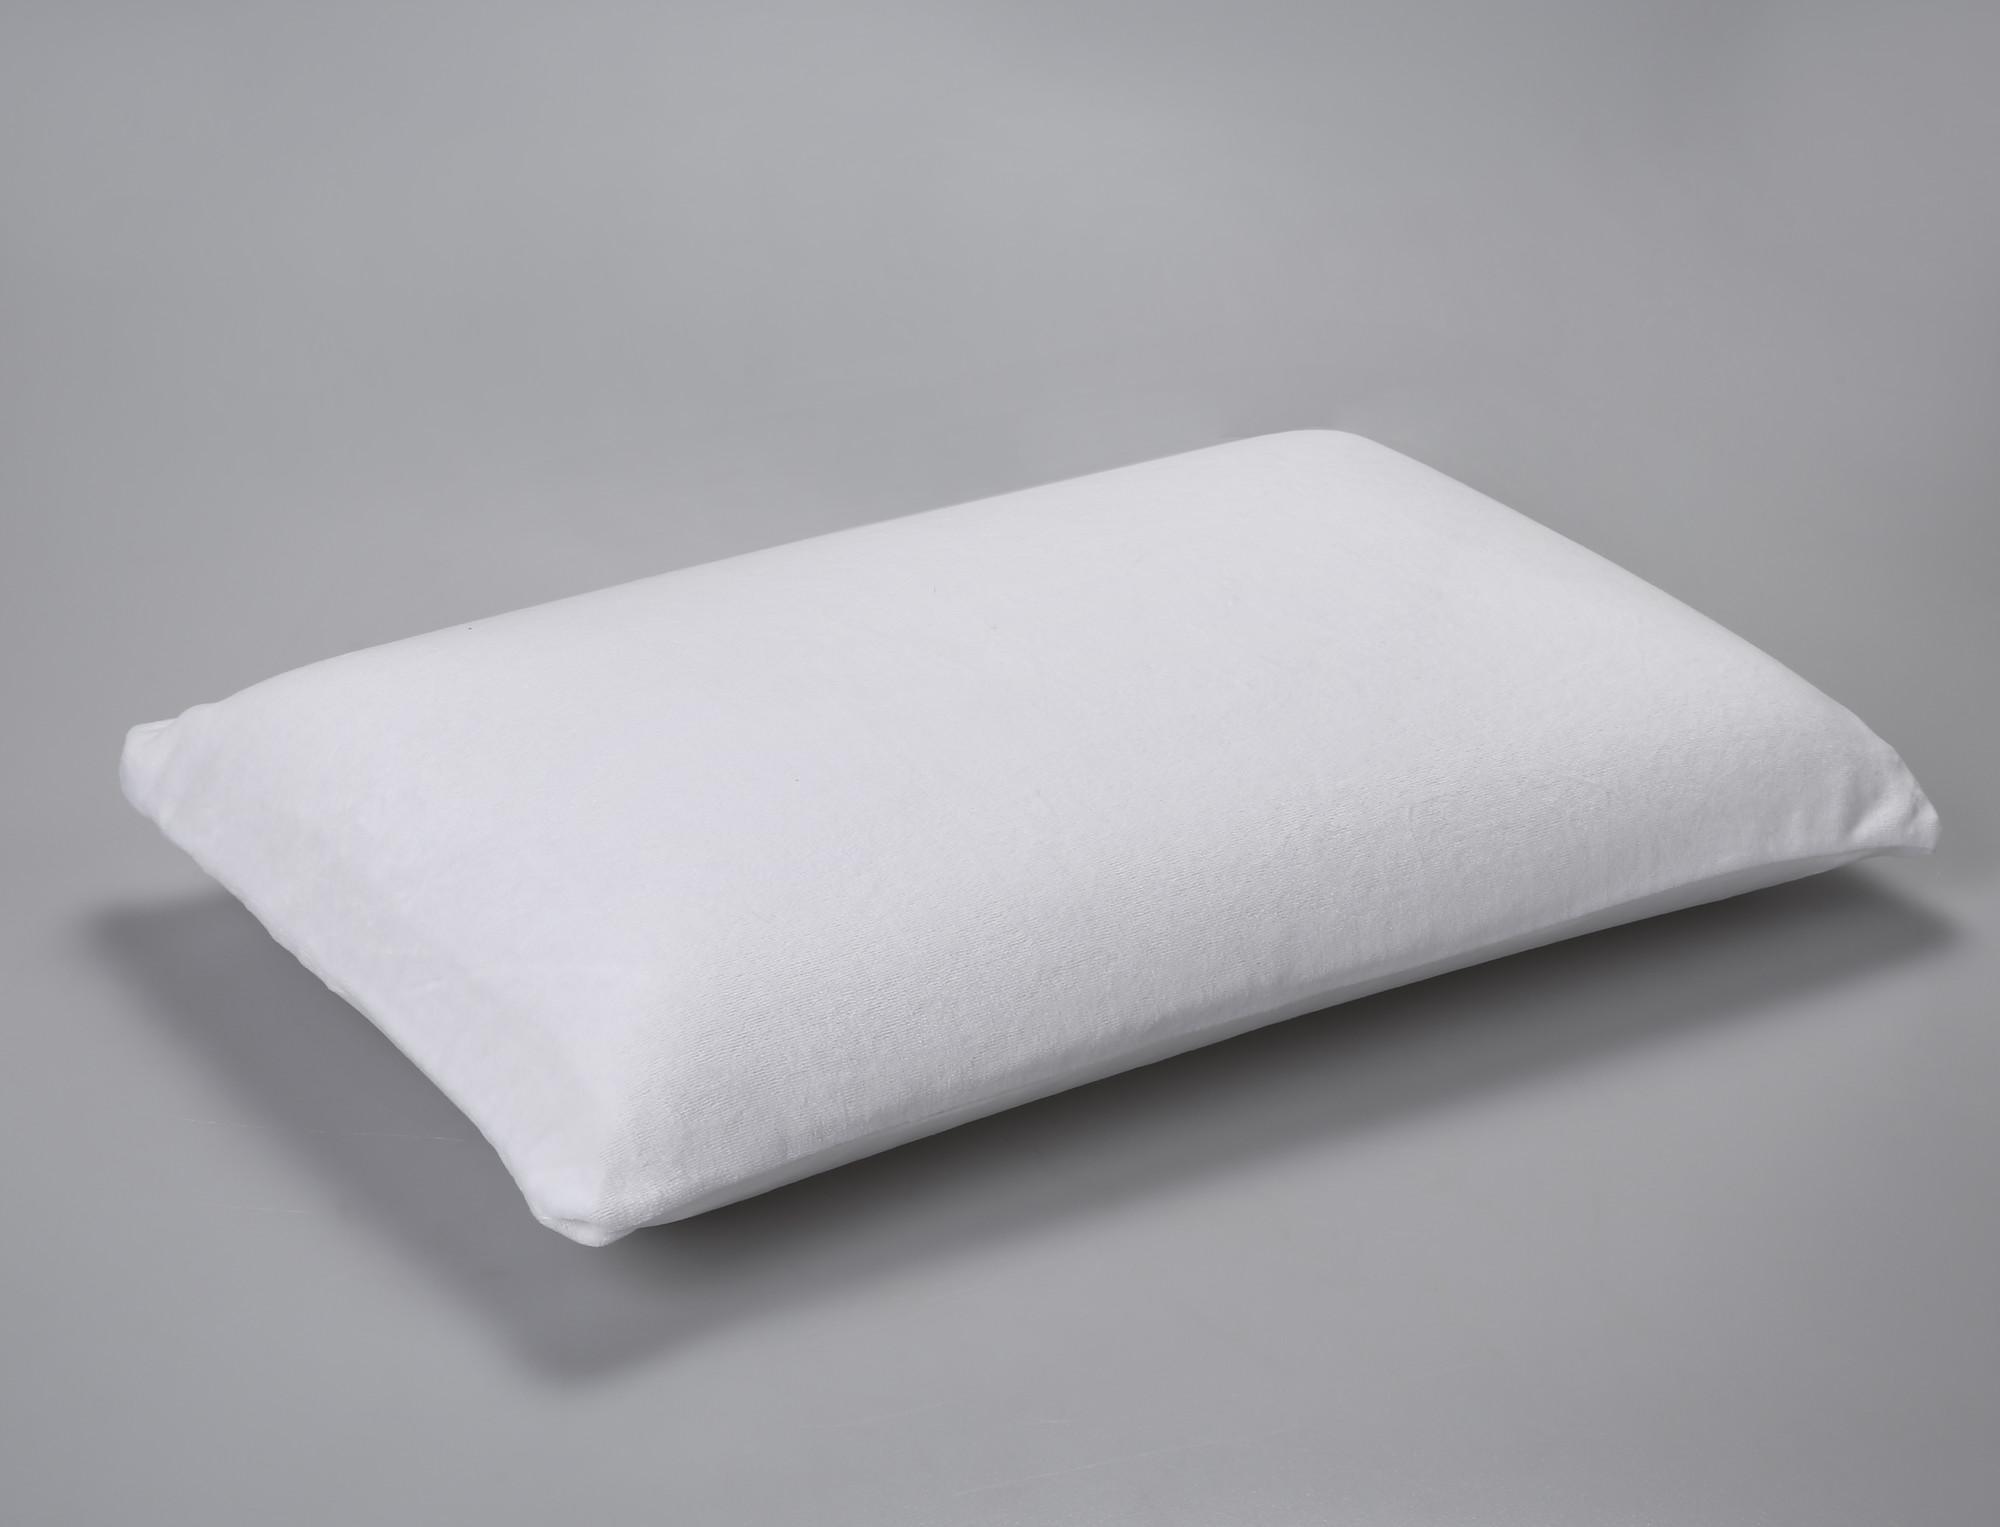 sleep easy kids pillow low profile soft feel talalay latex pillow